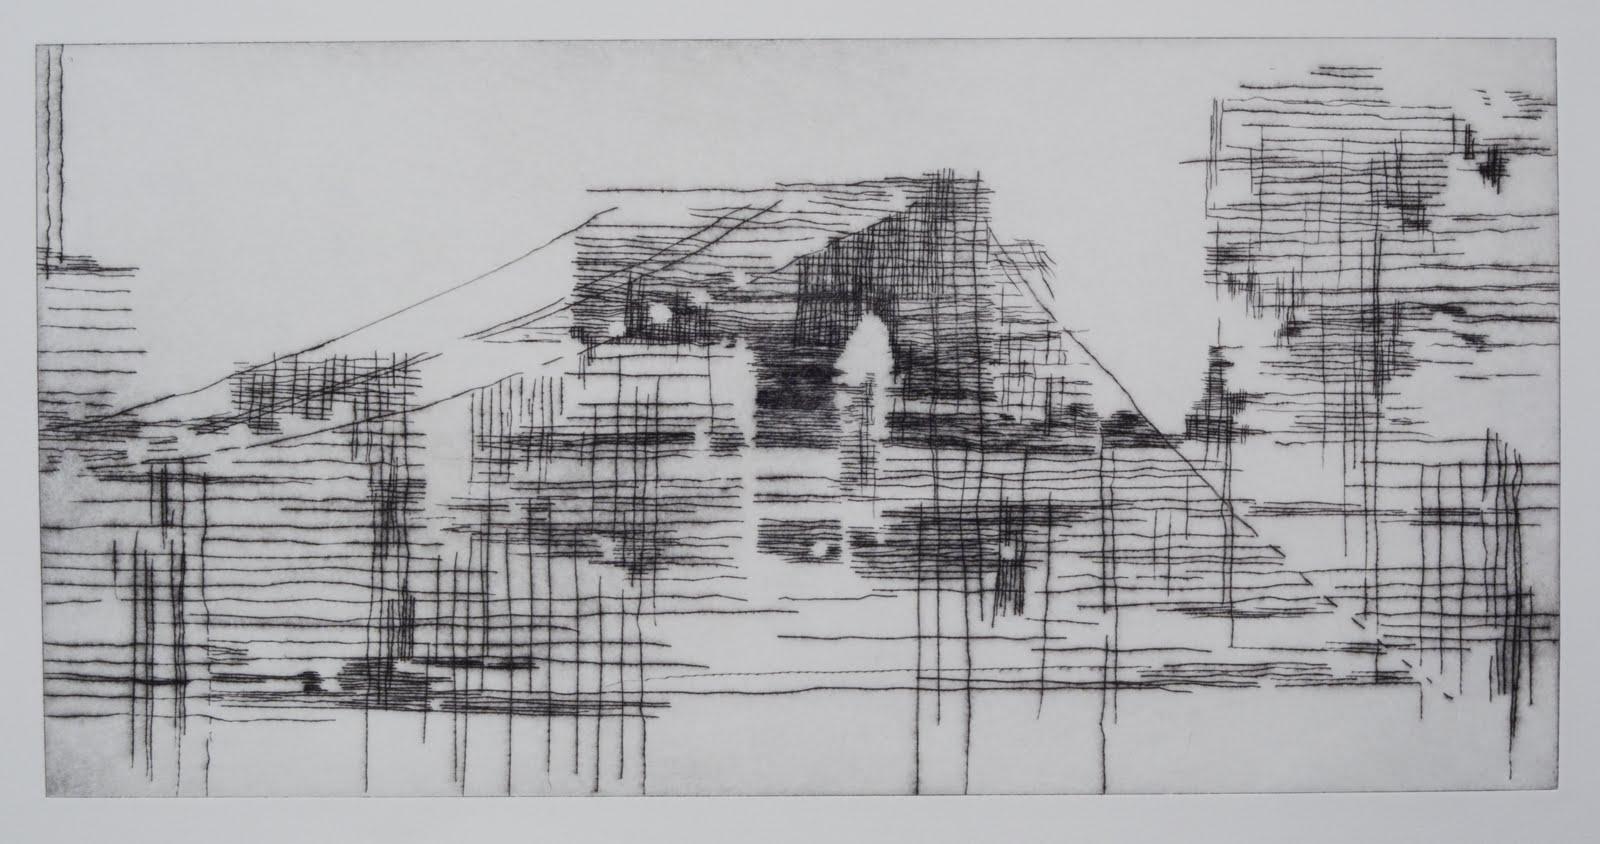 """Building a Bridge II (matrix)"", drypoint and monotype, 12 x 24 in."